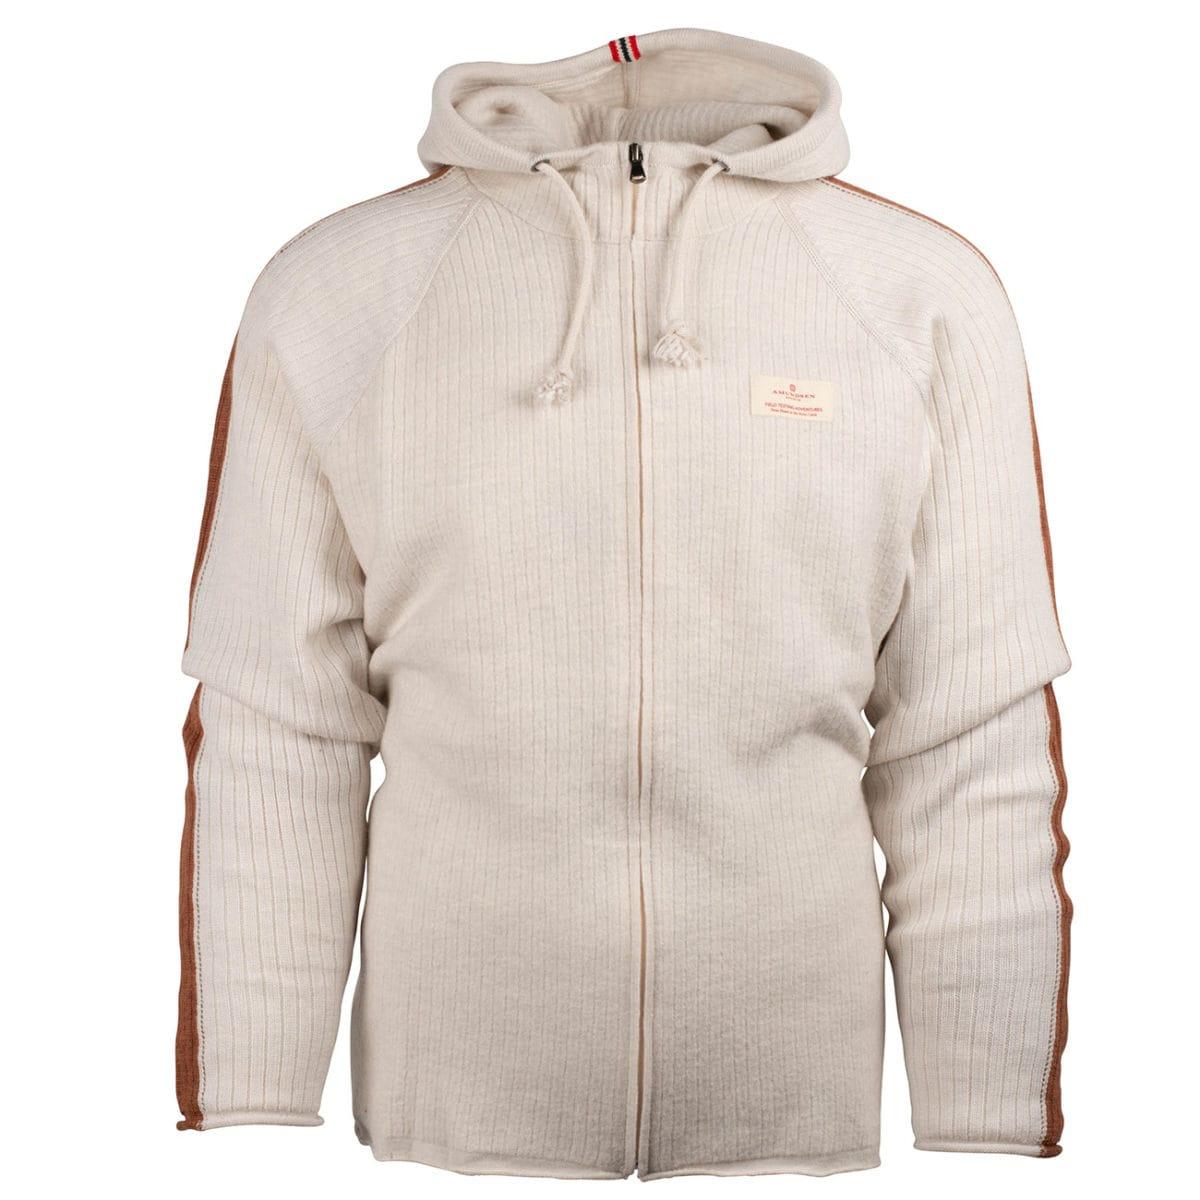 Amundsen Sports Boiled Jacket Stripes, M's